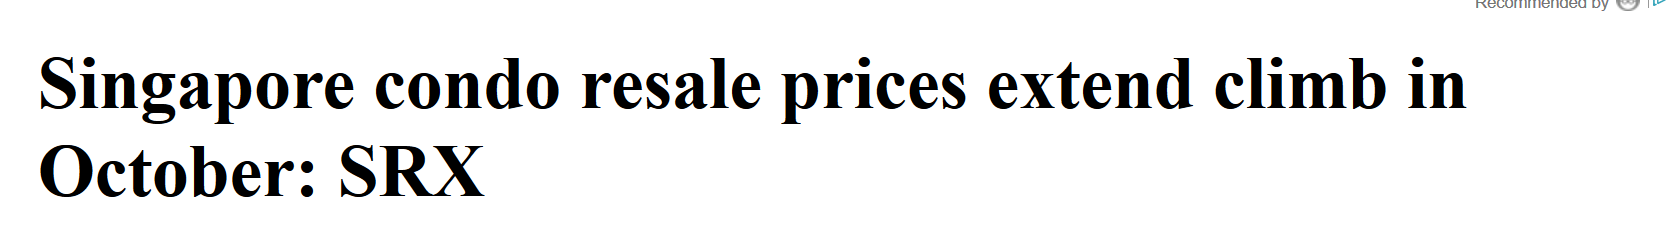 Singapore condo resale prices extend climb in October SRX